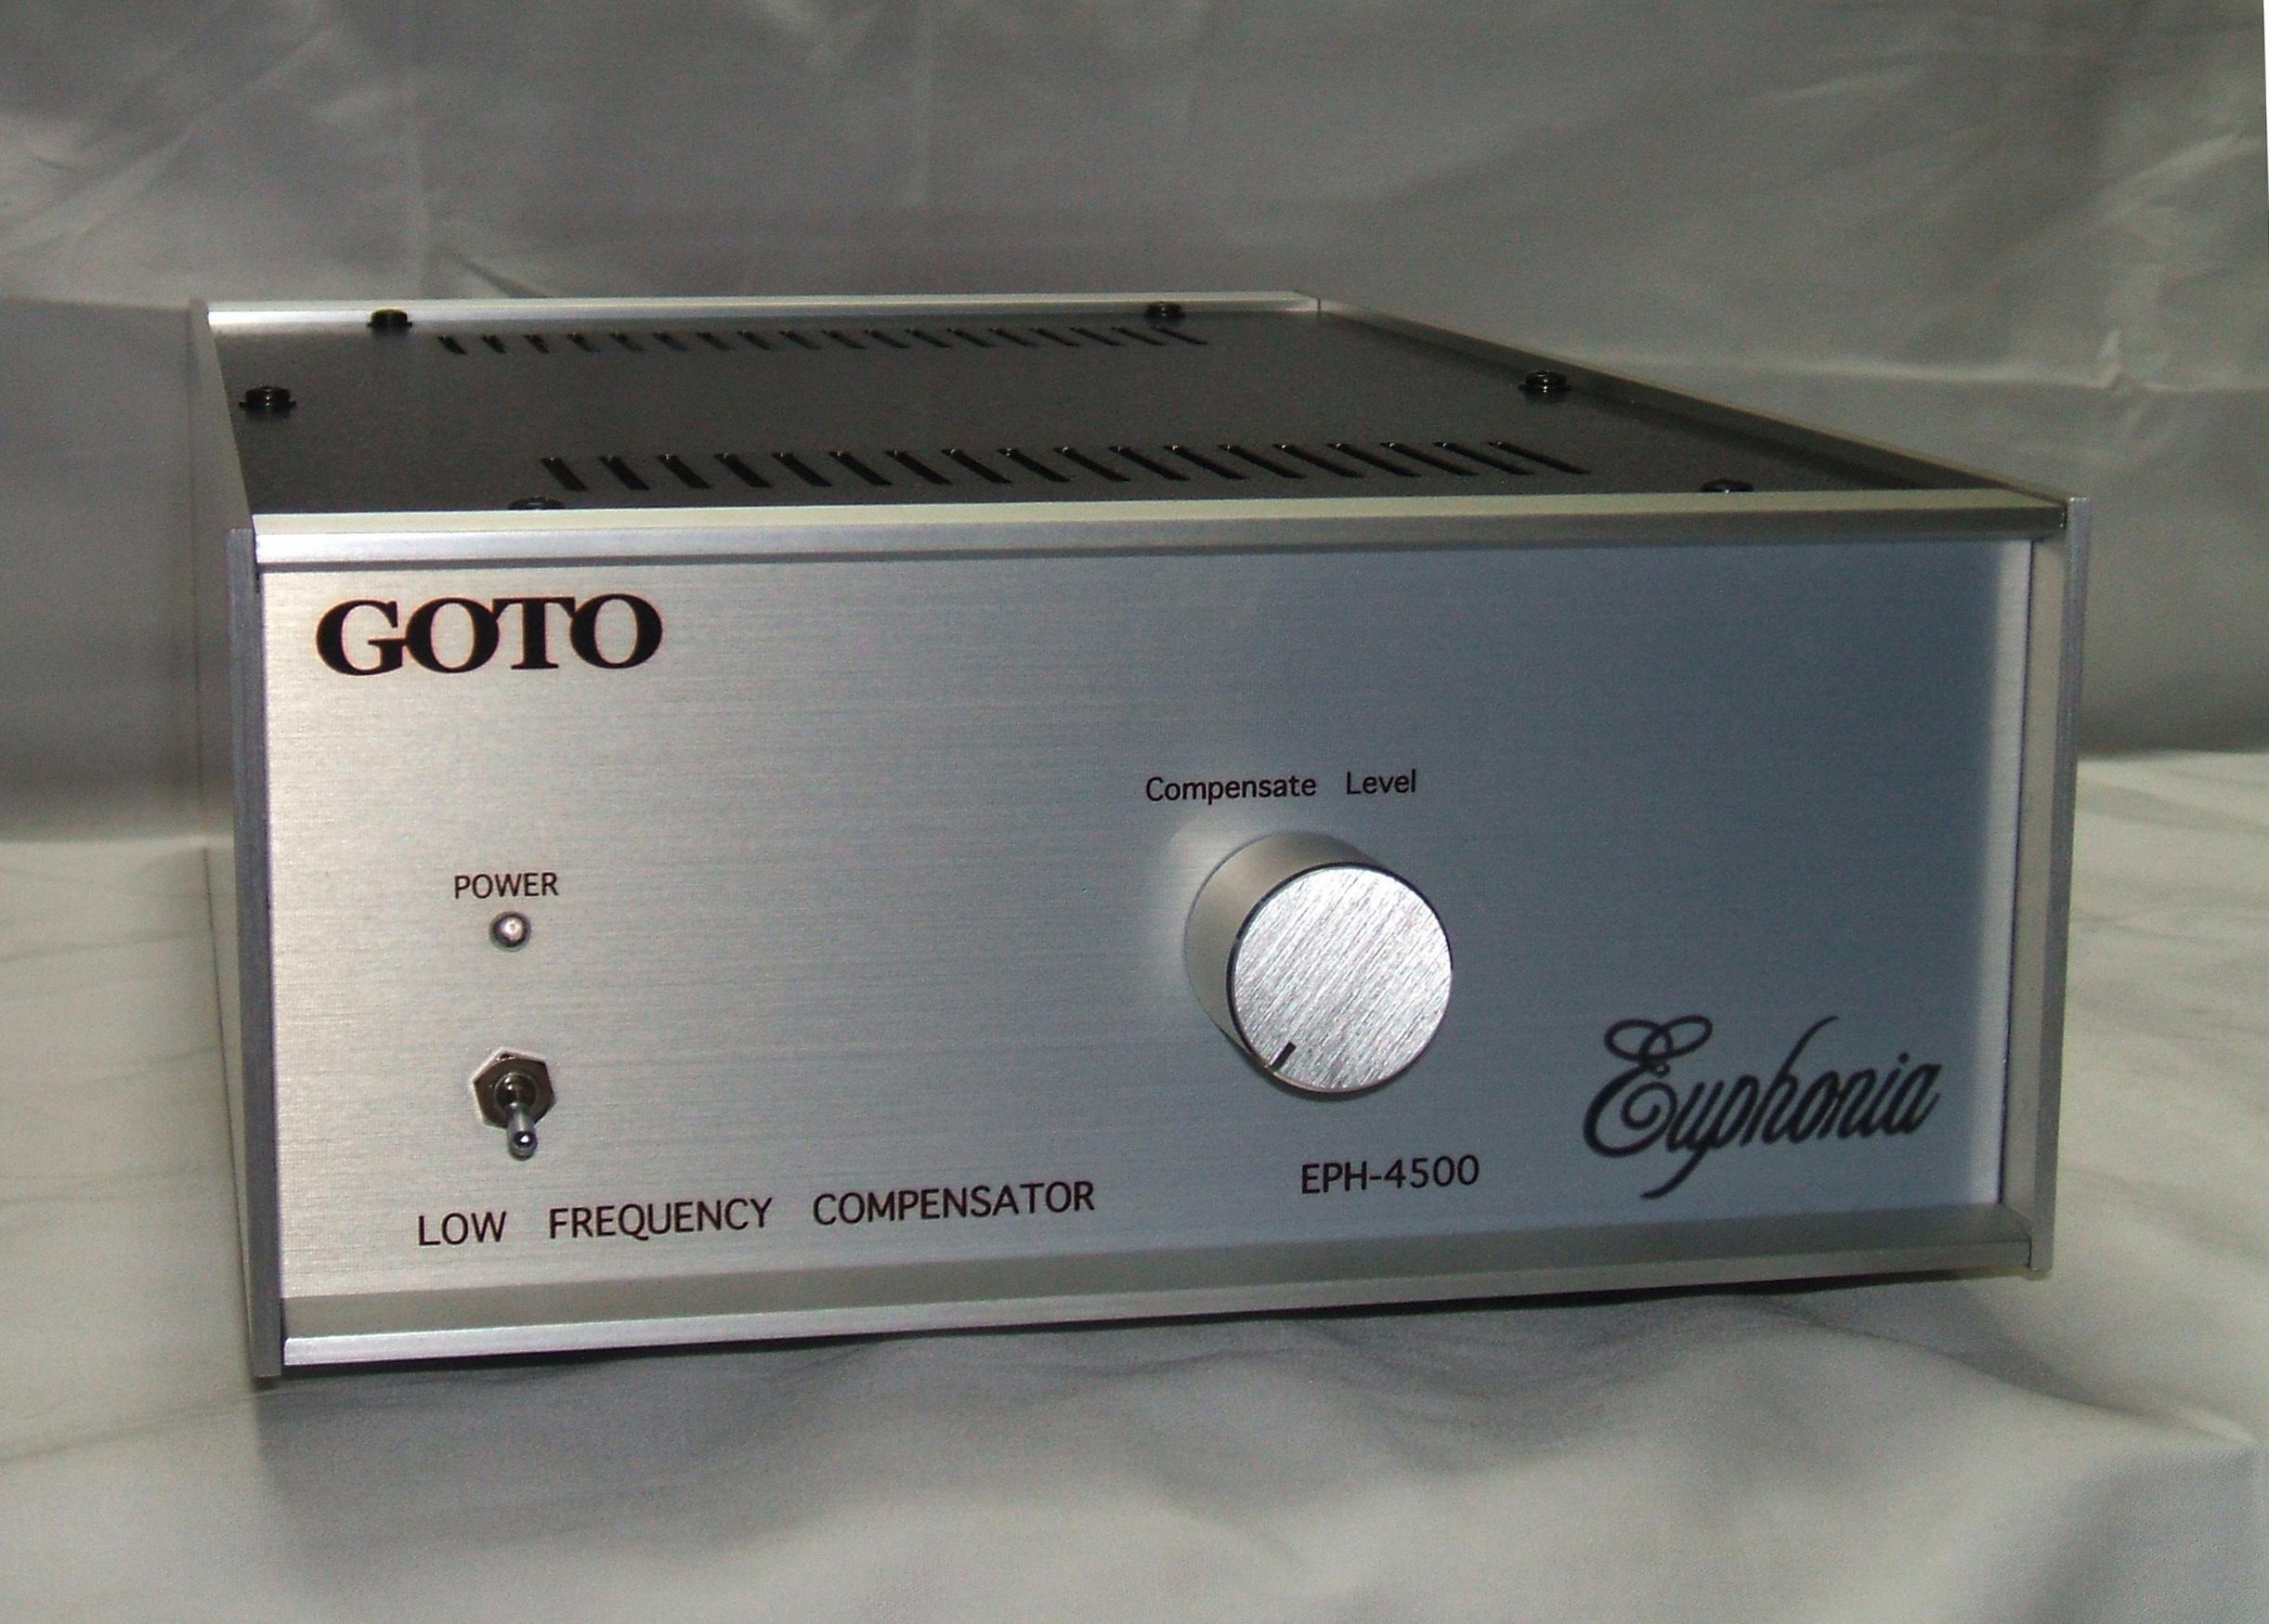 EPH-4500